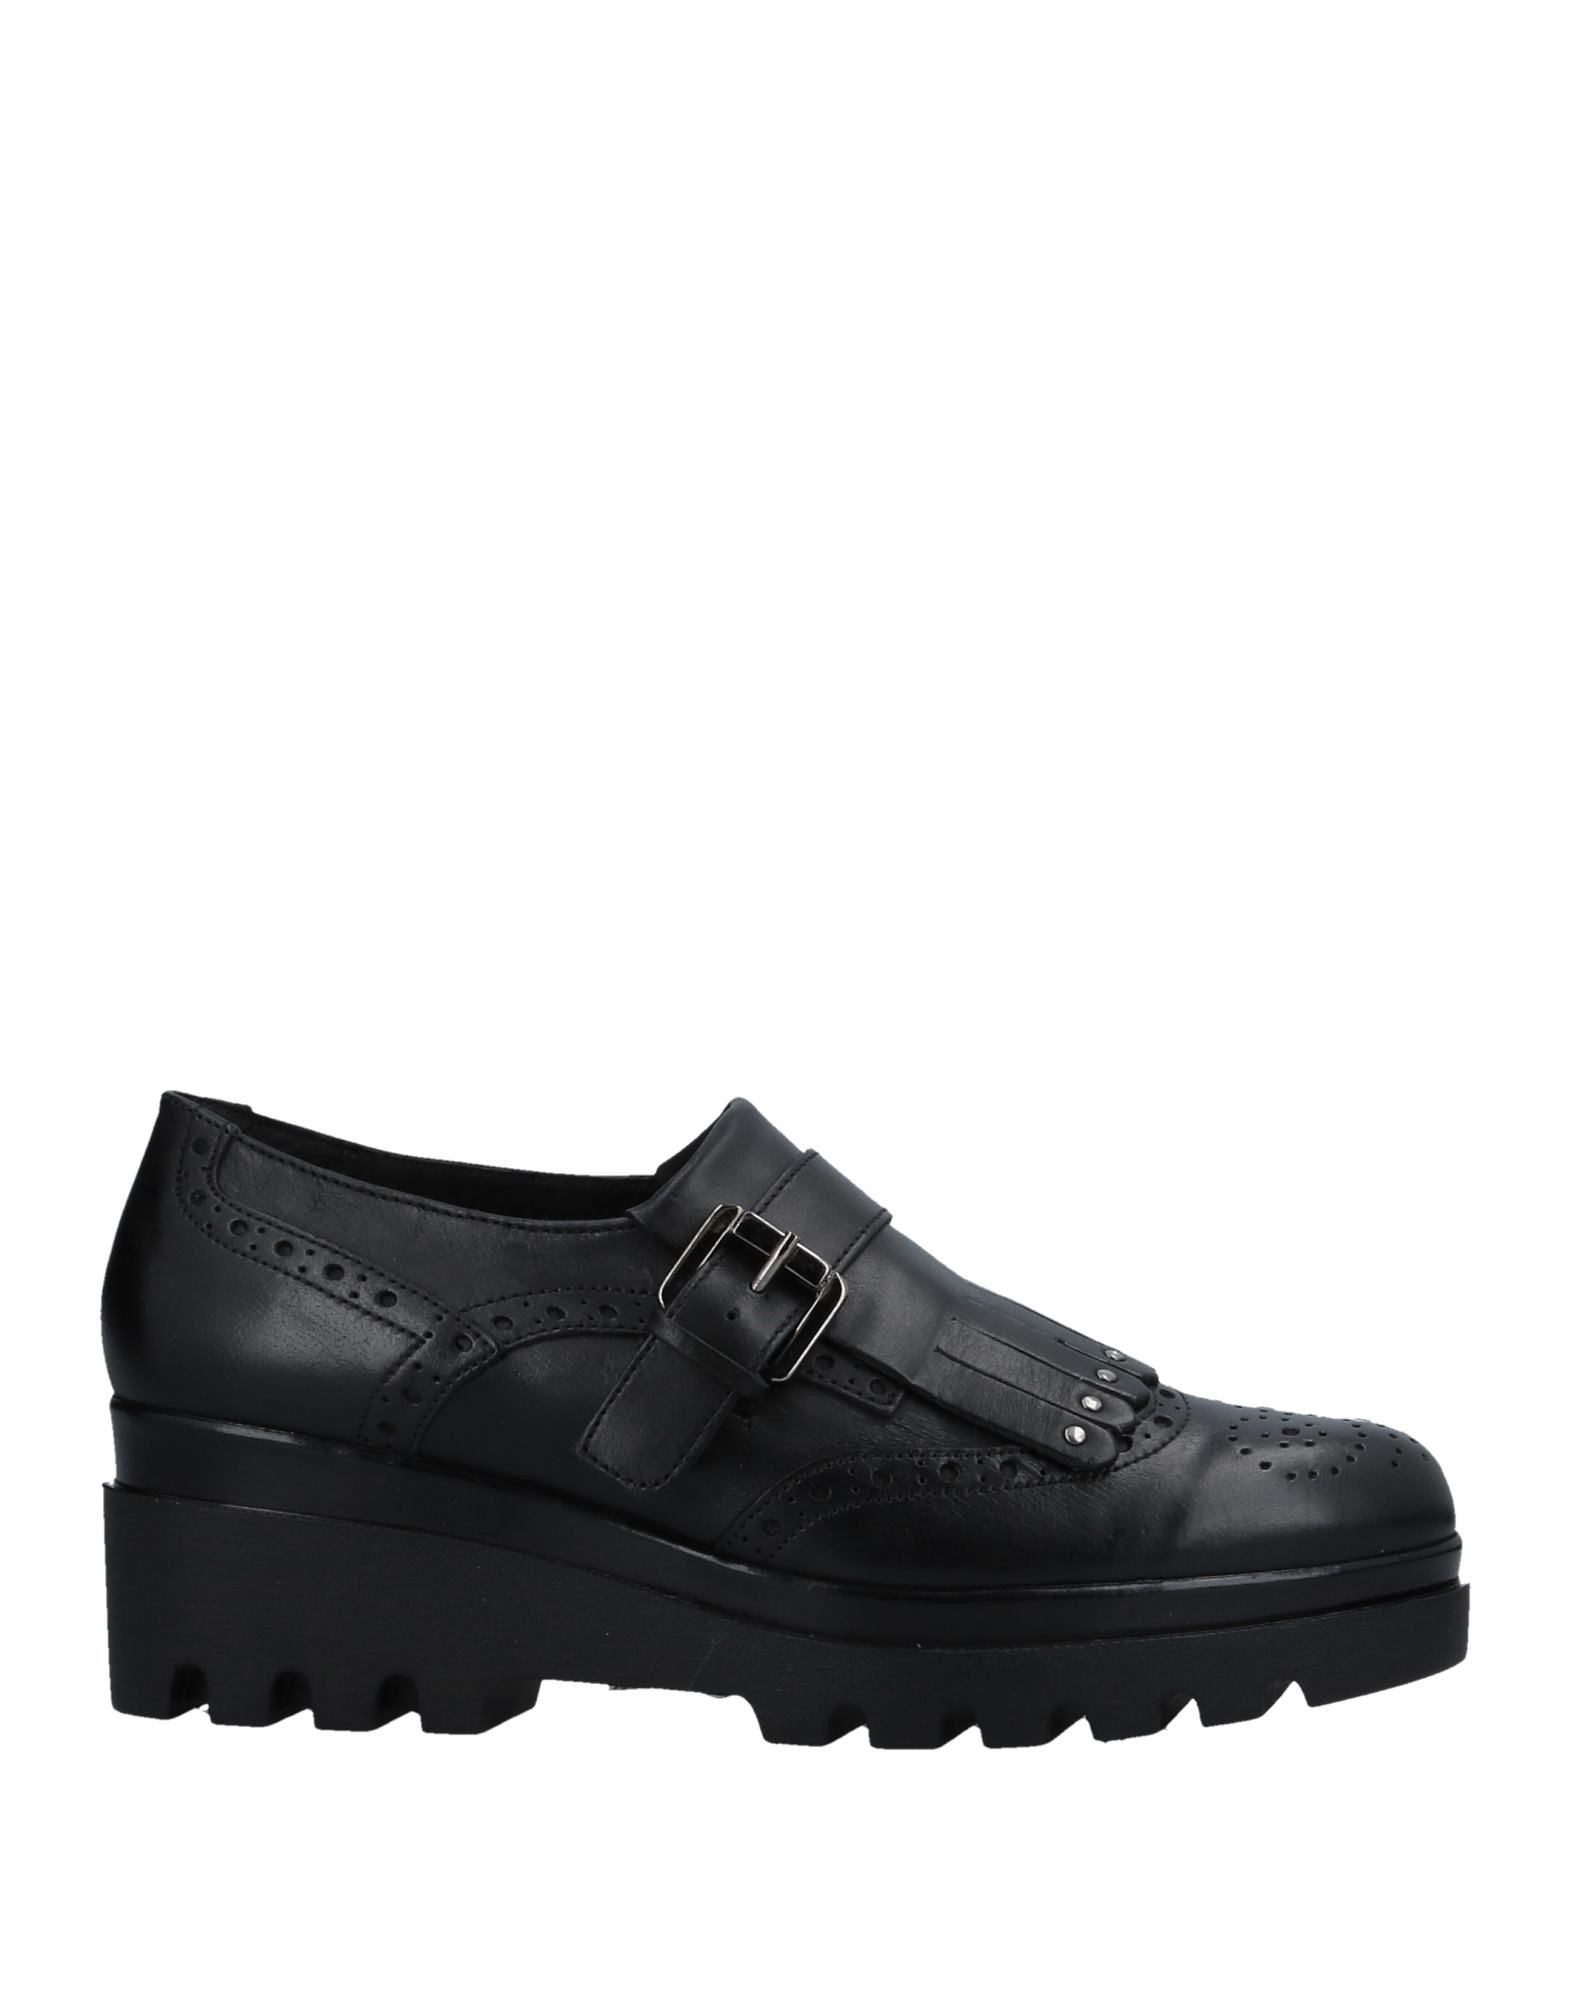 Loretta By Loretta Mokassins Damen  11506194PJ Gute Qualität Qualität Qualität beliebte Schuhe 66e219